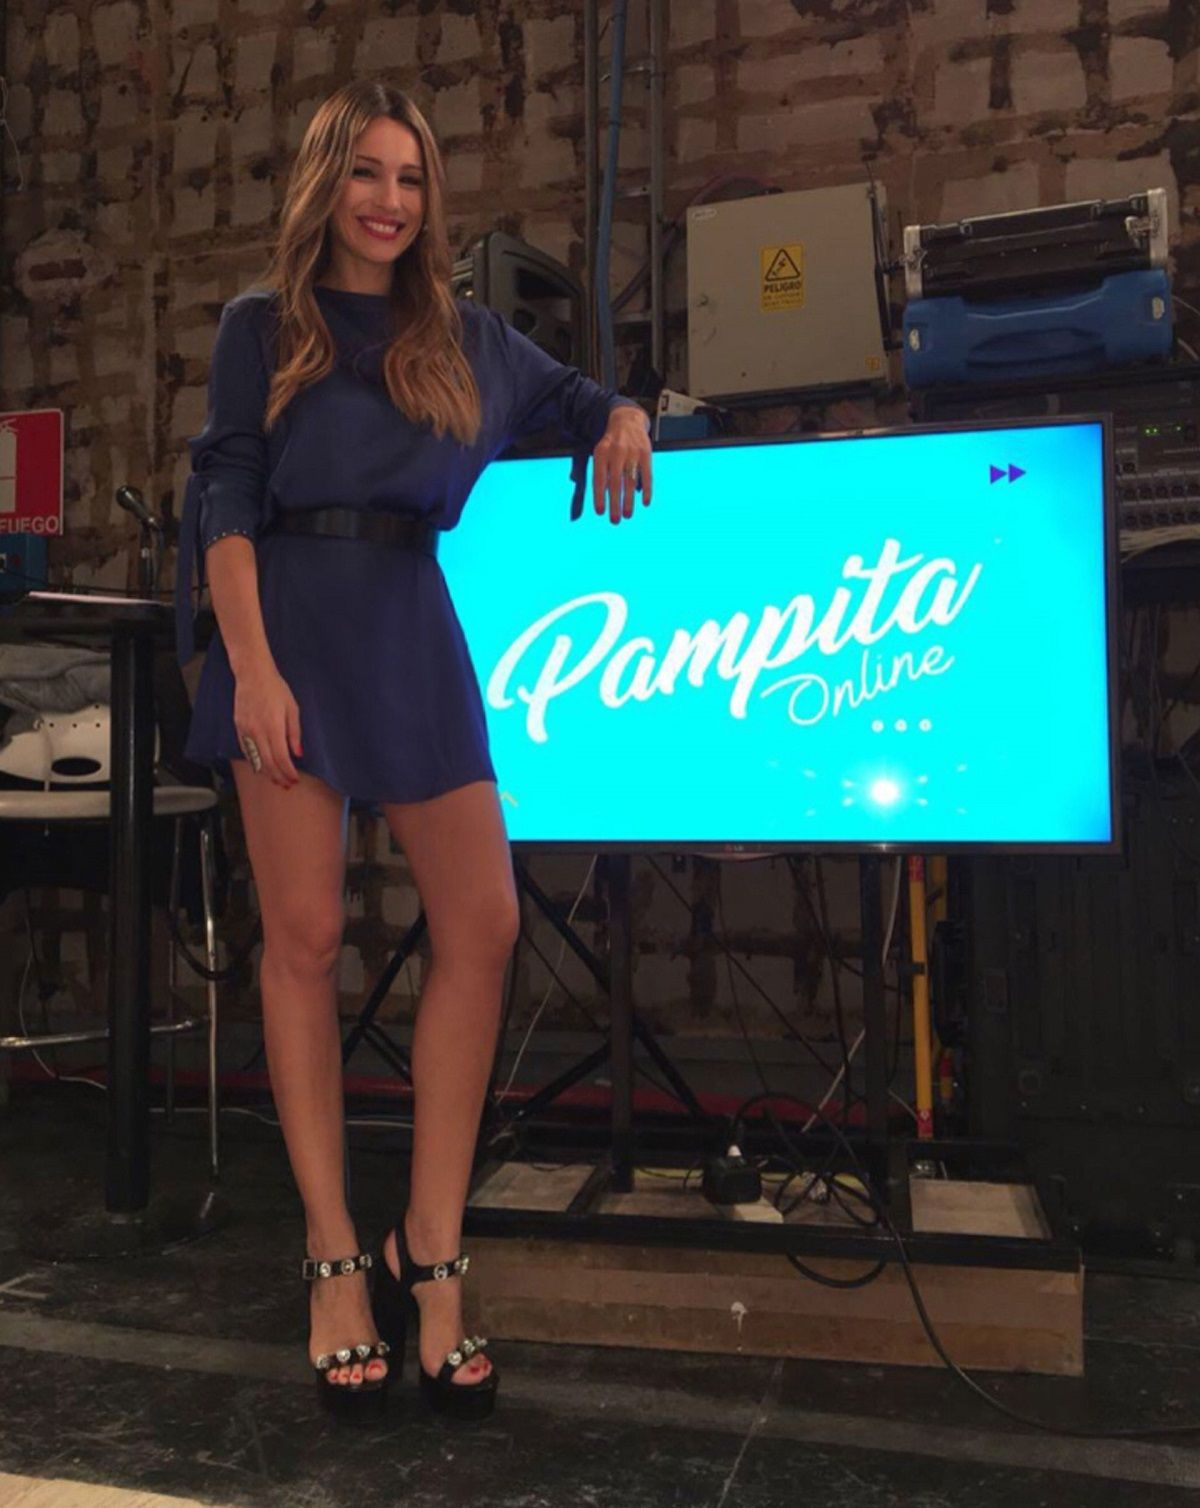 Pampita Online solo irá de lunes a jueves